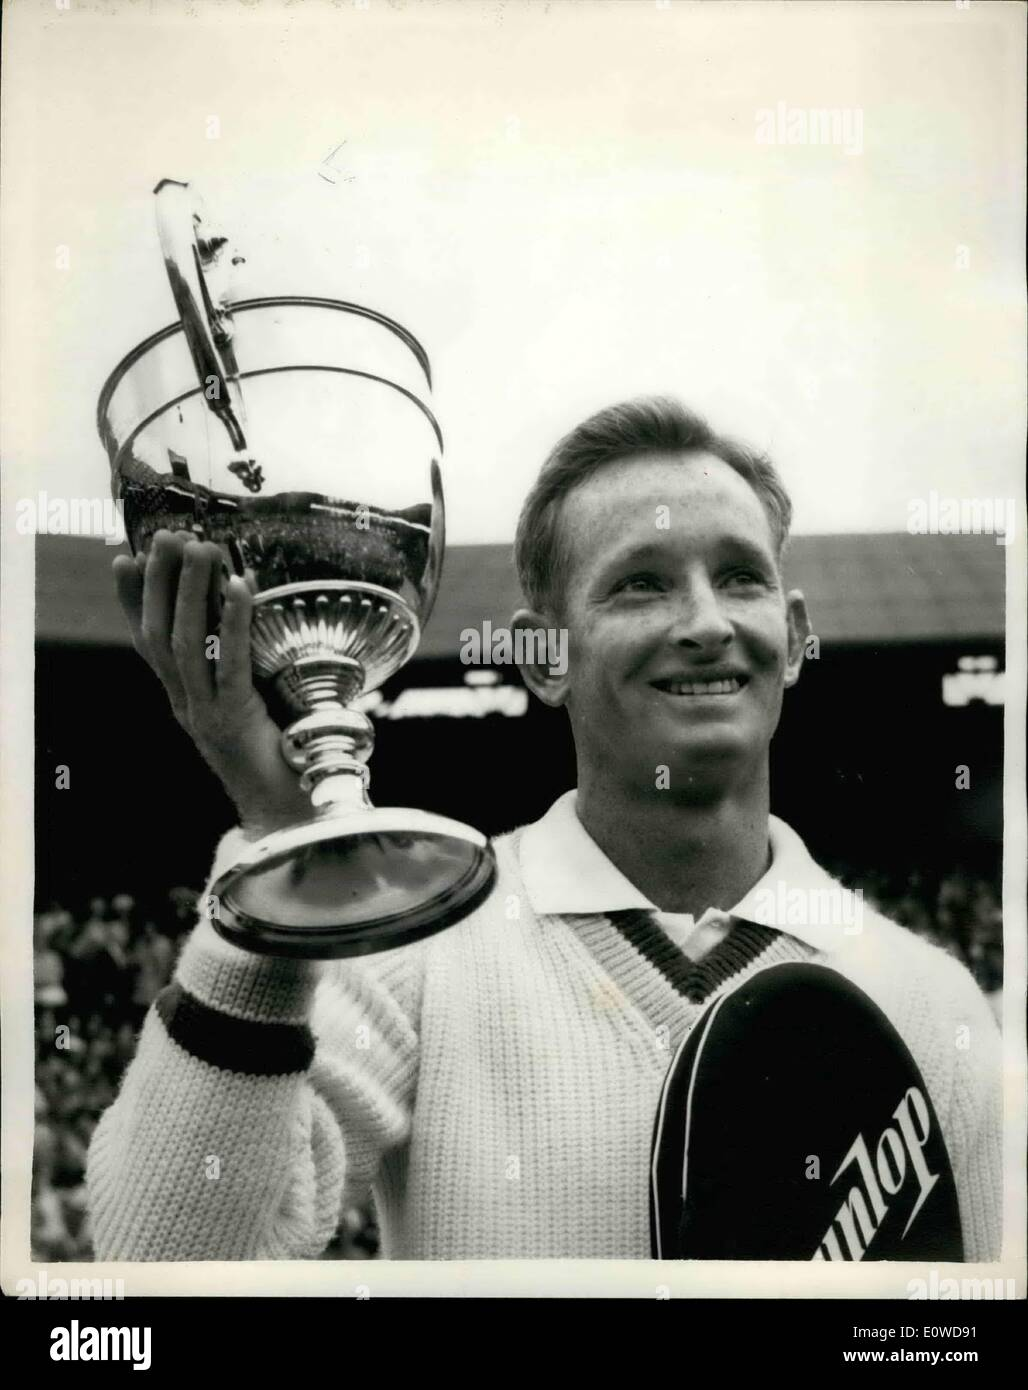 Jun 06 1962 Laver wins Wimbledon Title again shows Rod